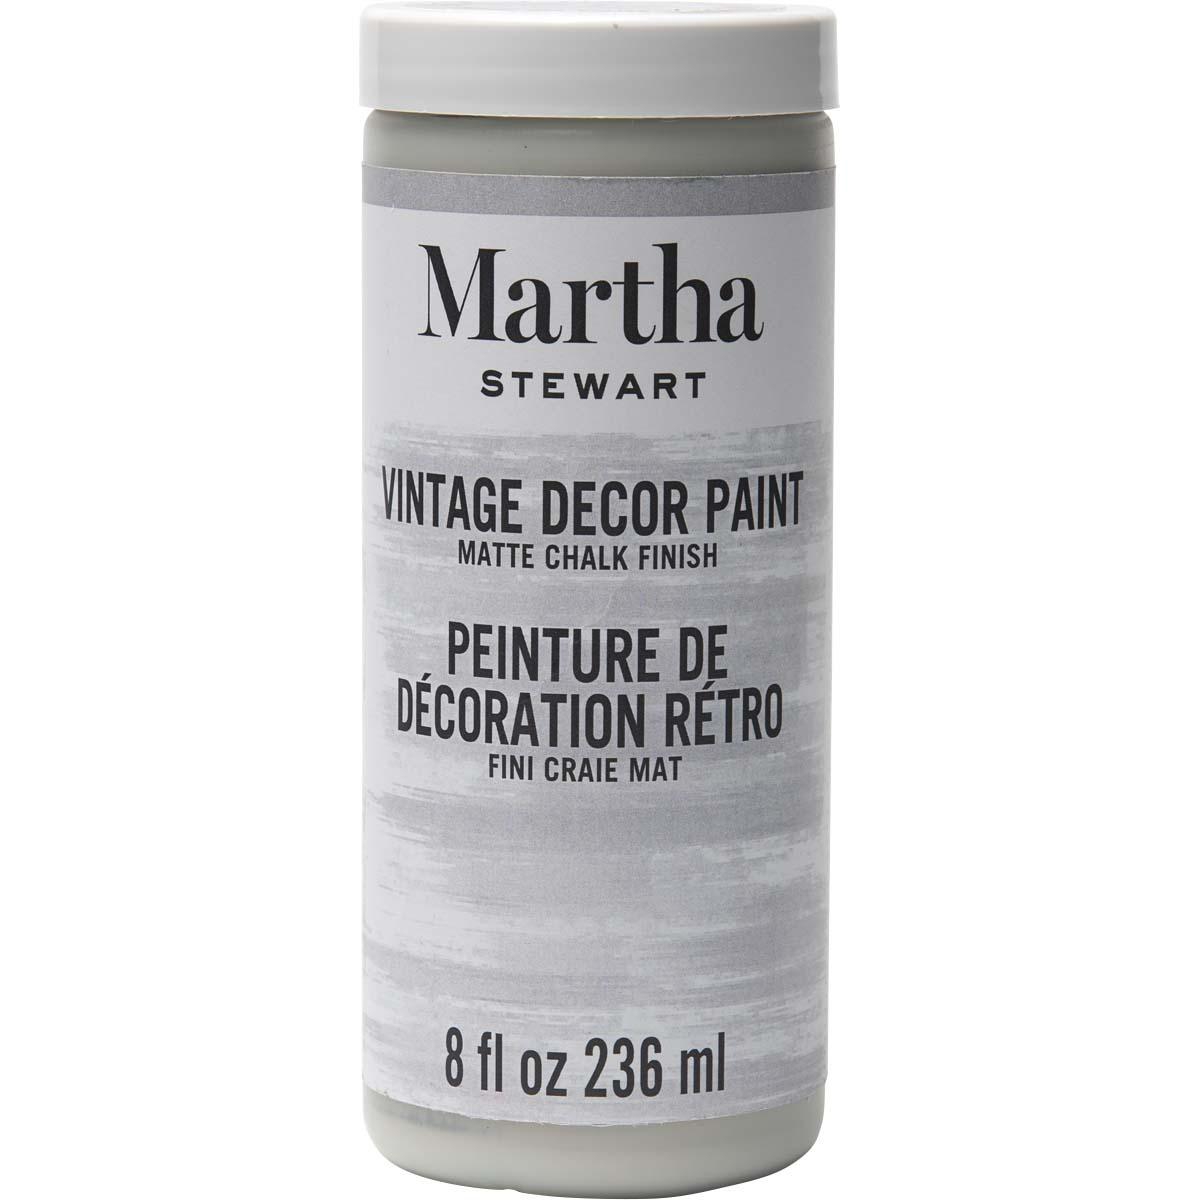 MARTHA STEWART VINTAGE PAINT 8 OZ. SMOKE